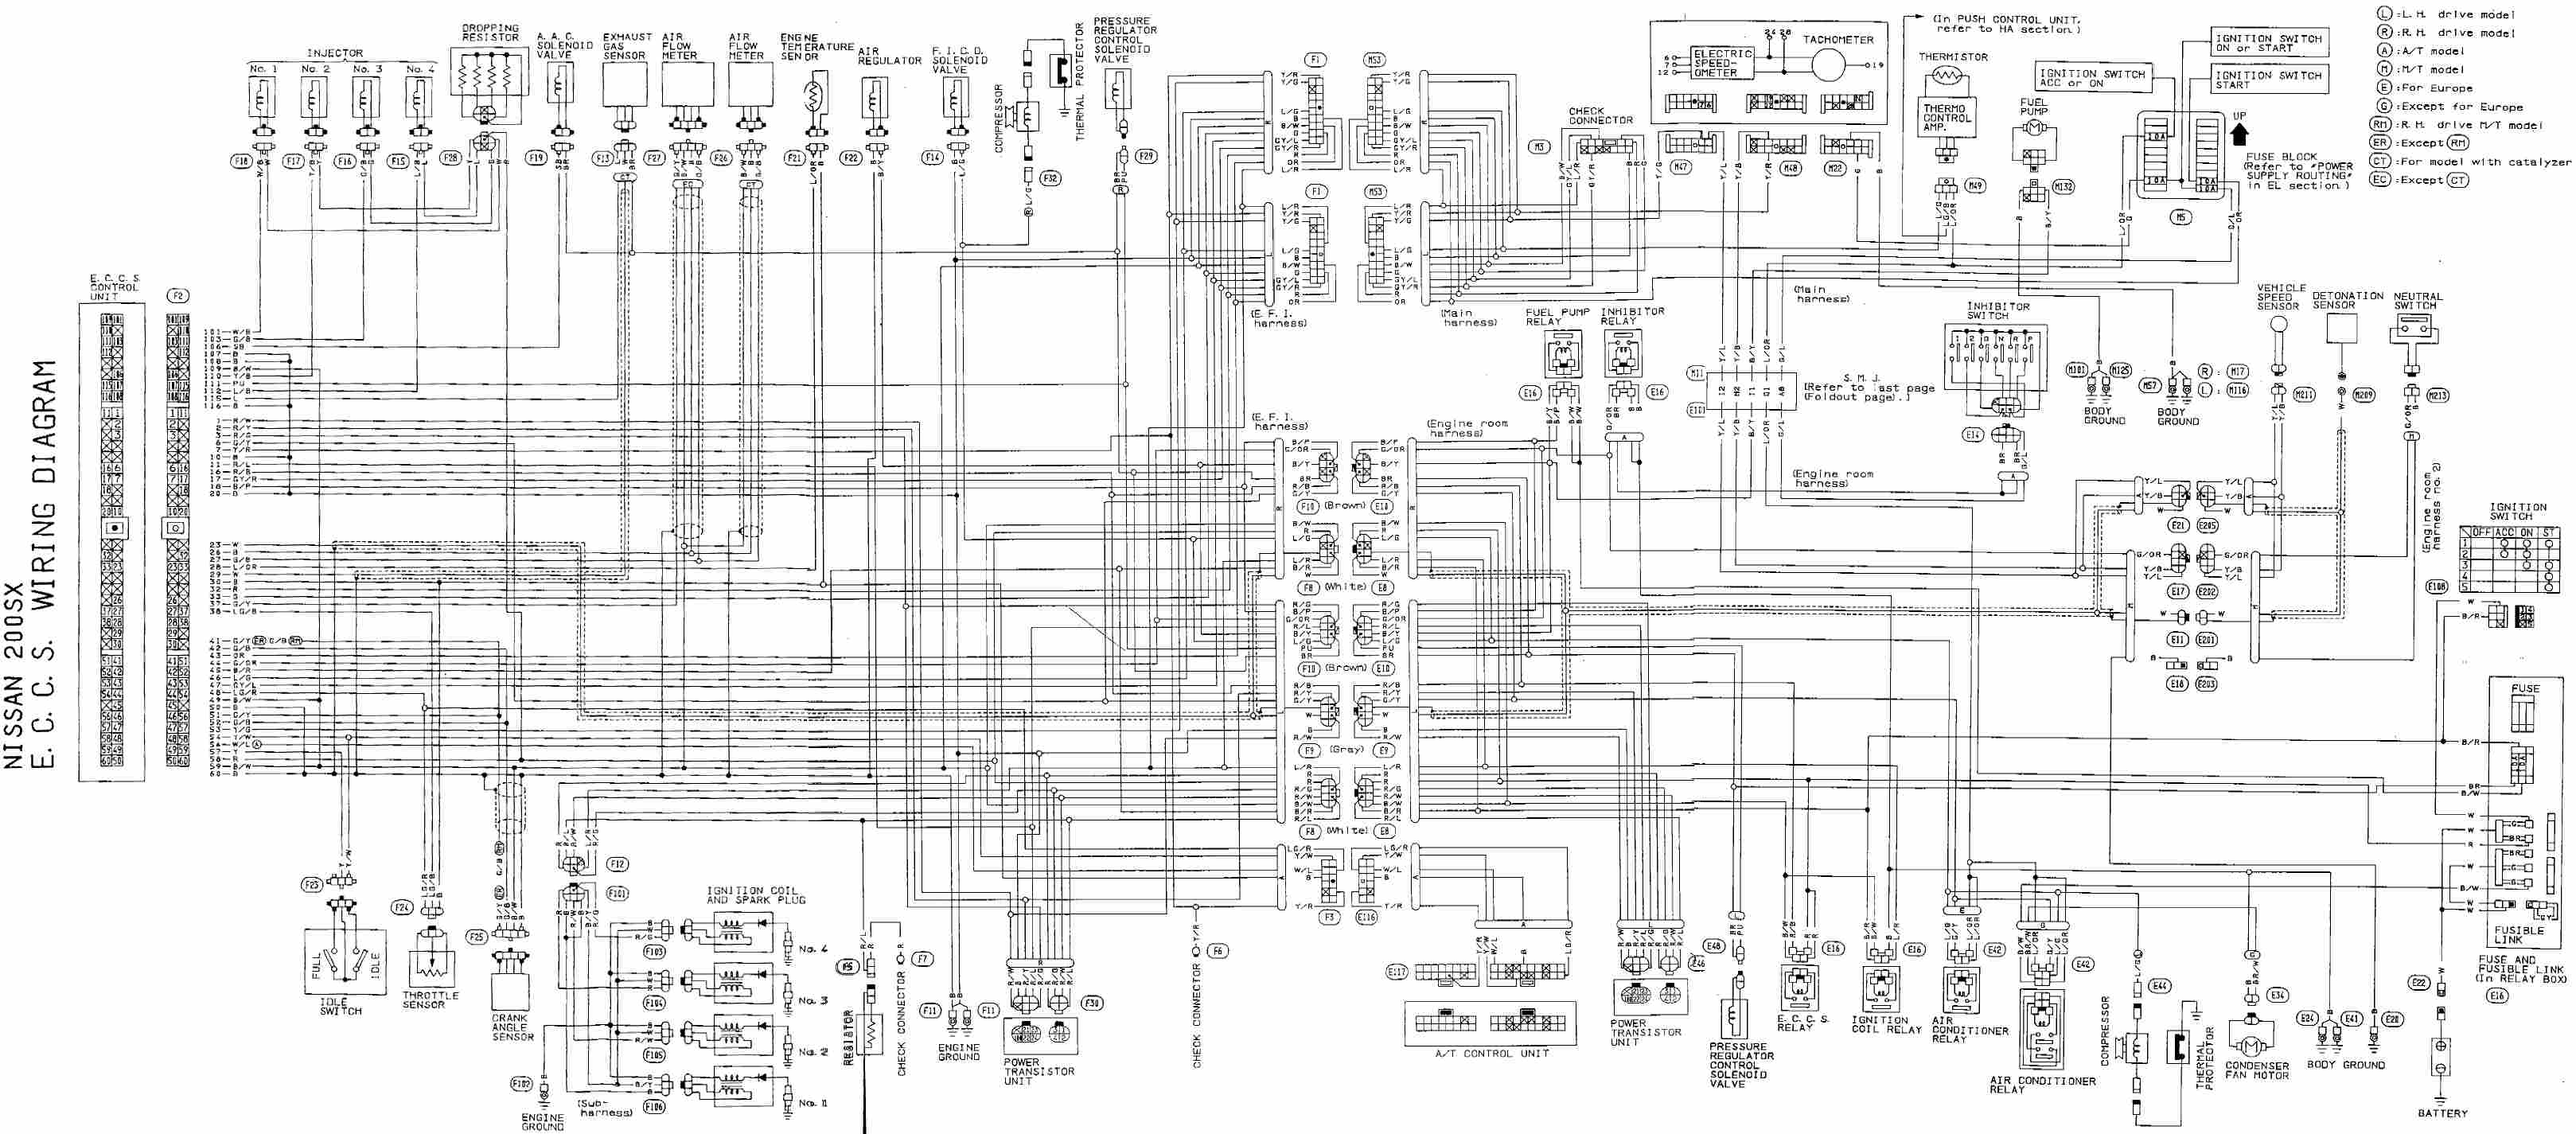 complete eccs wiring diagram of nissan 200x?t\\\=1508500919 1992 nissan 240sx wiring diagram 1992 nissan 240sx engine \u2022 wiring nissan wiring schematics at soozxer.org